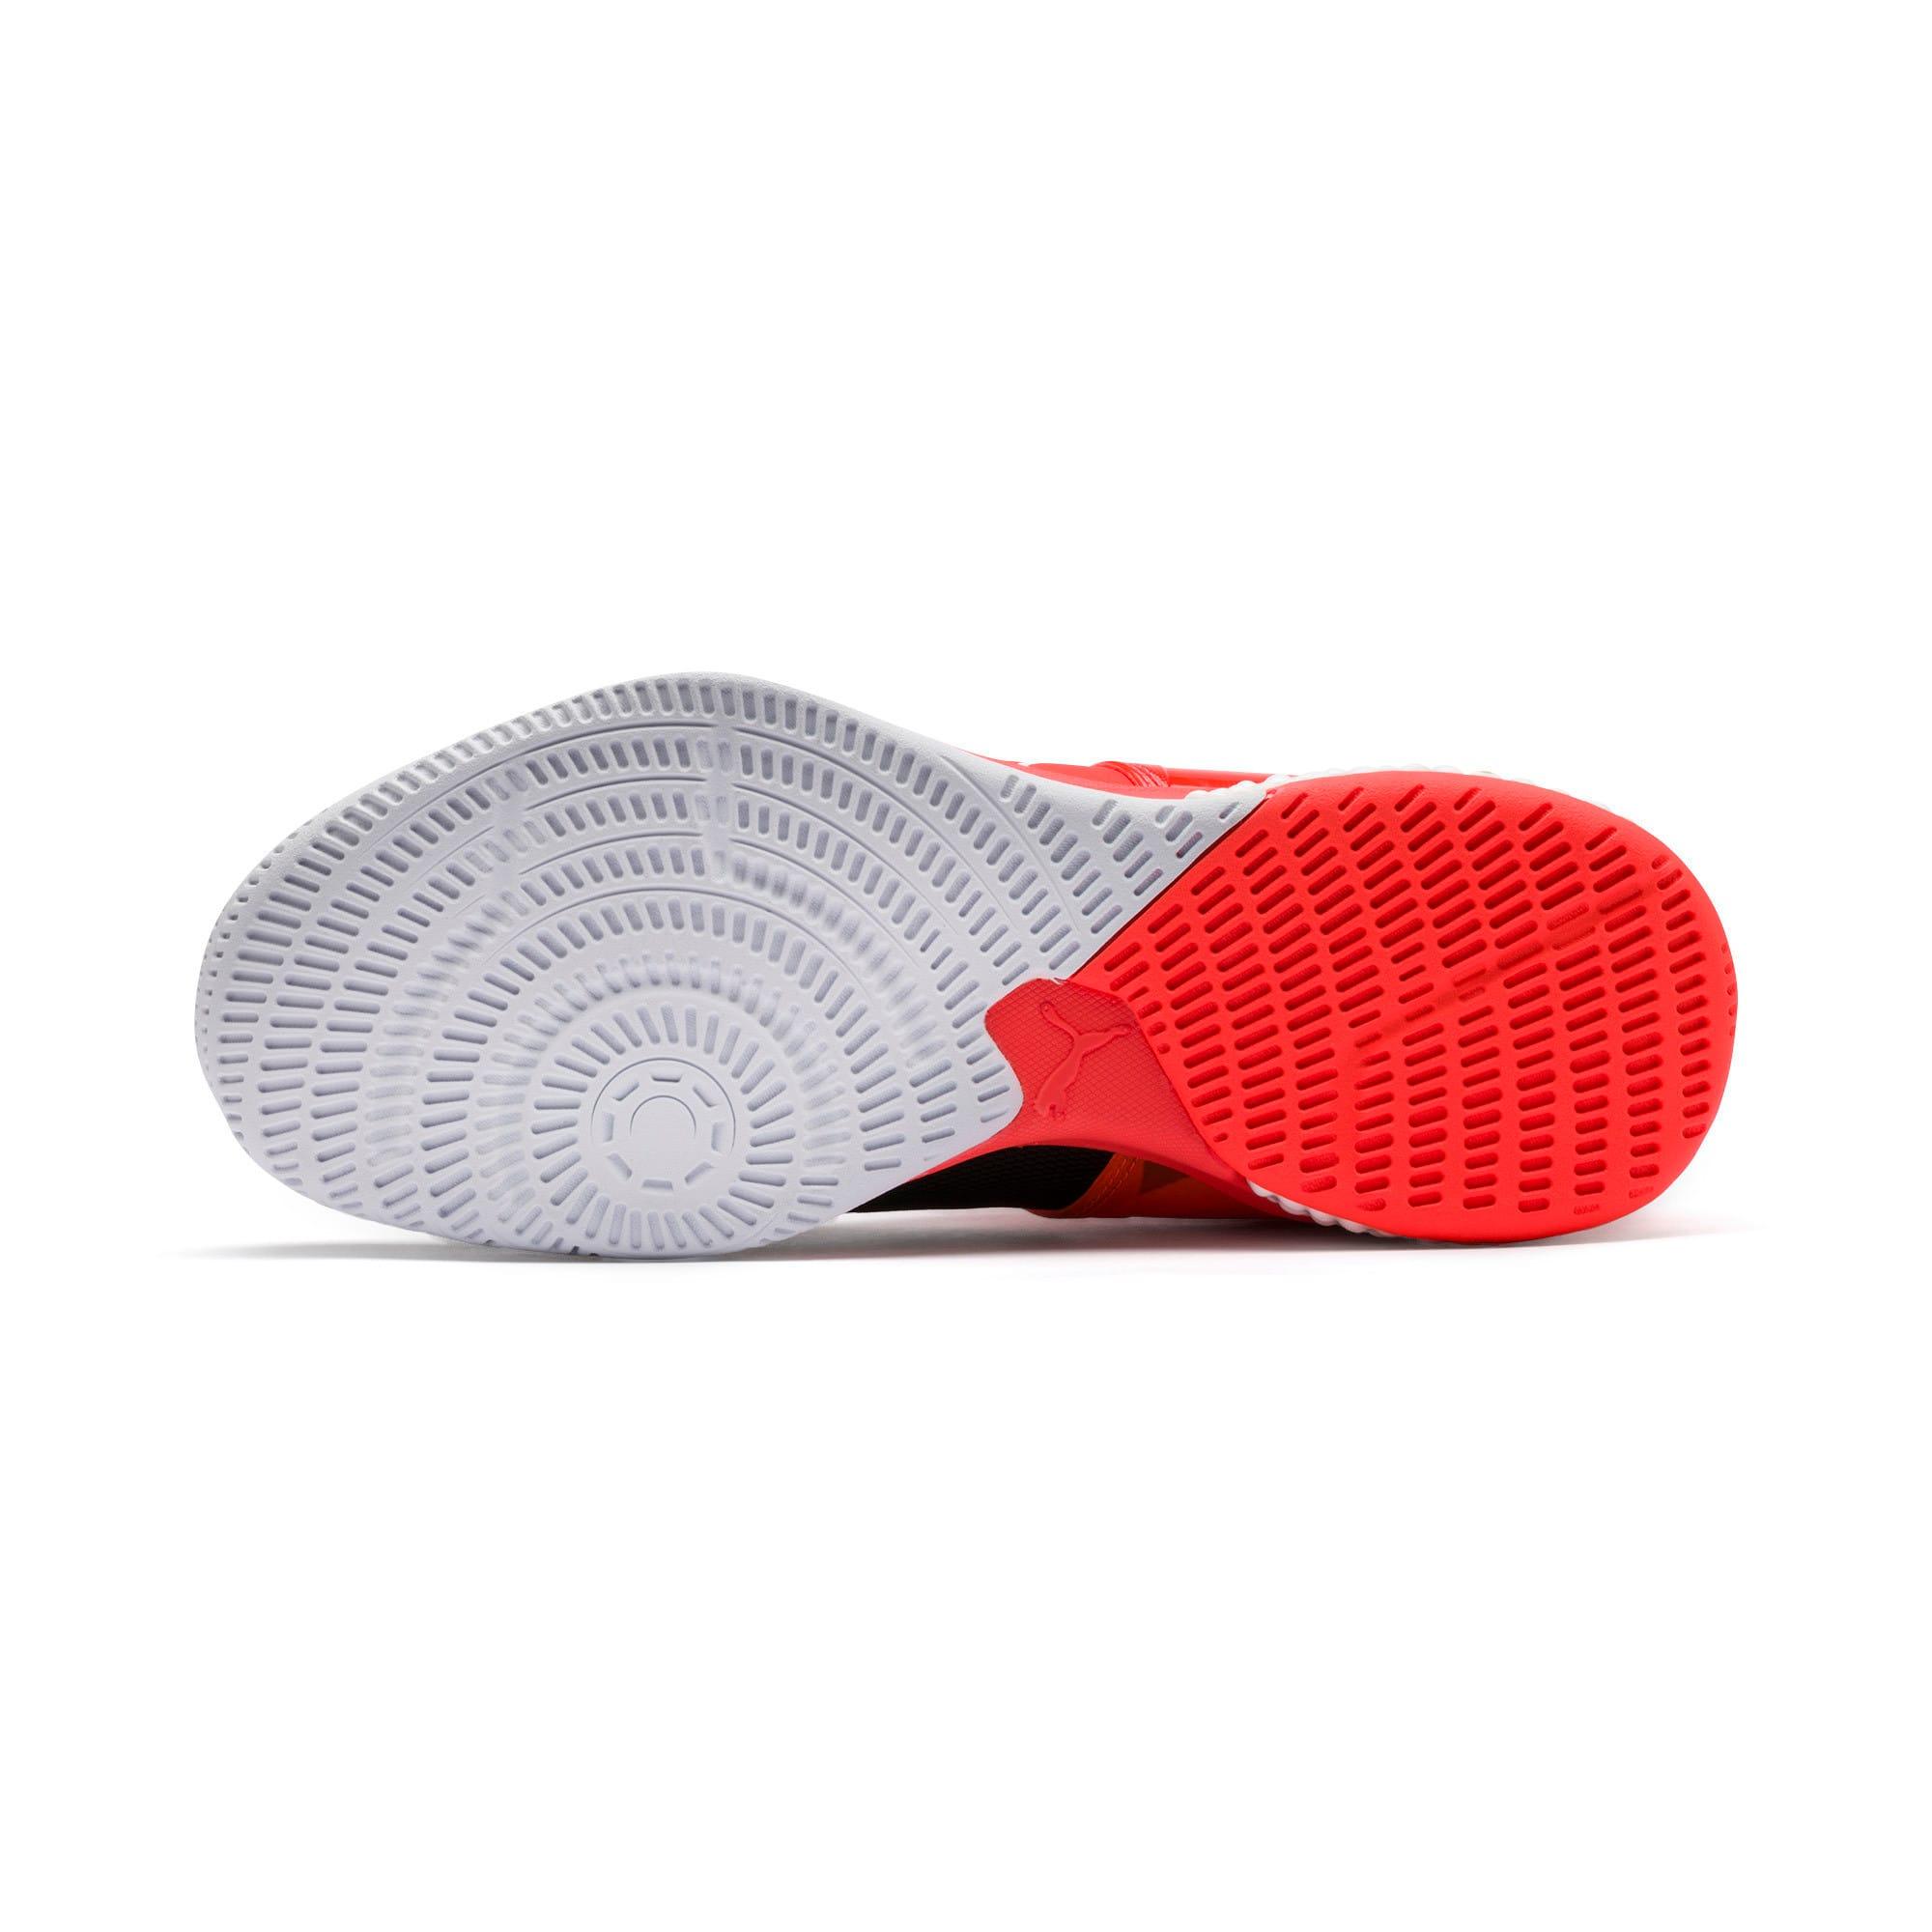 Thumbnail 5 of Chaussures Handball Explode XT Hybrid 2 Training, Black-Puma White-Nrgy Red, medium